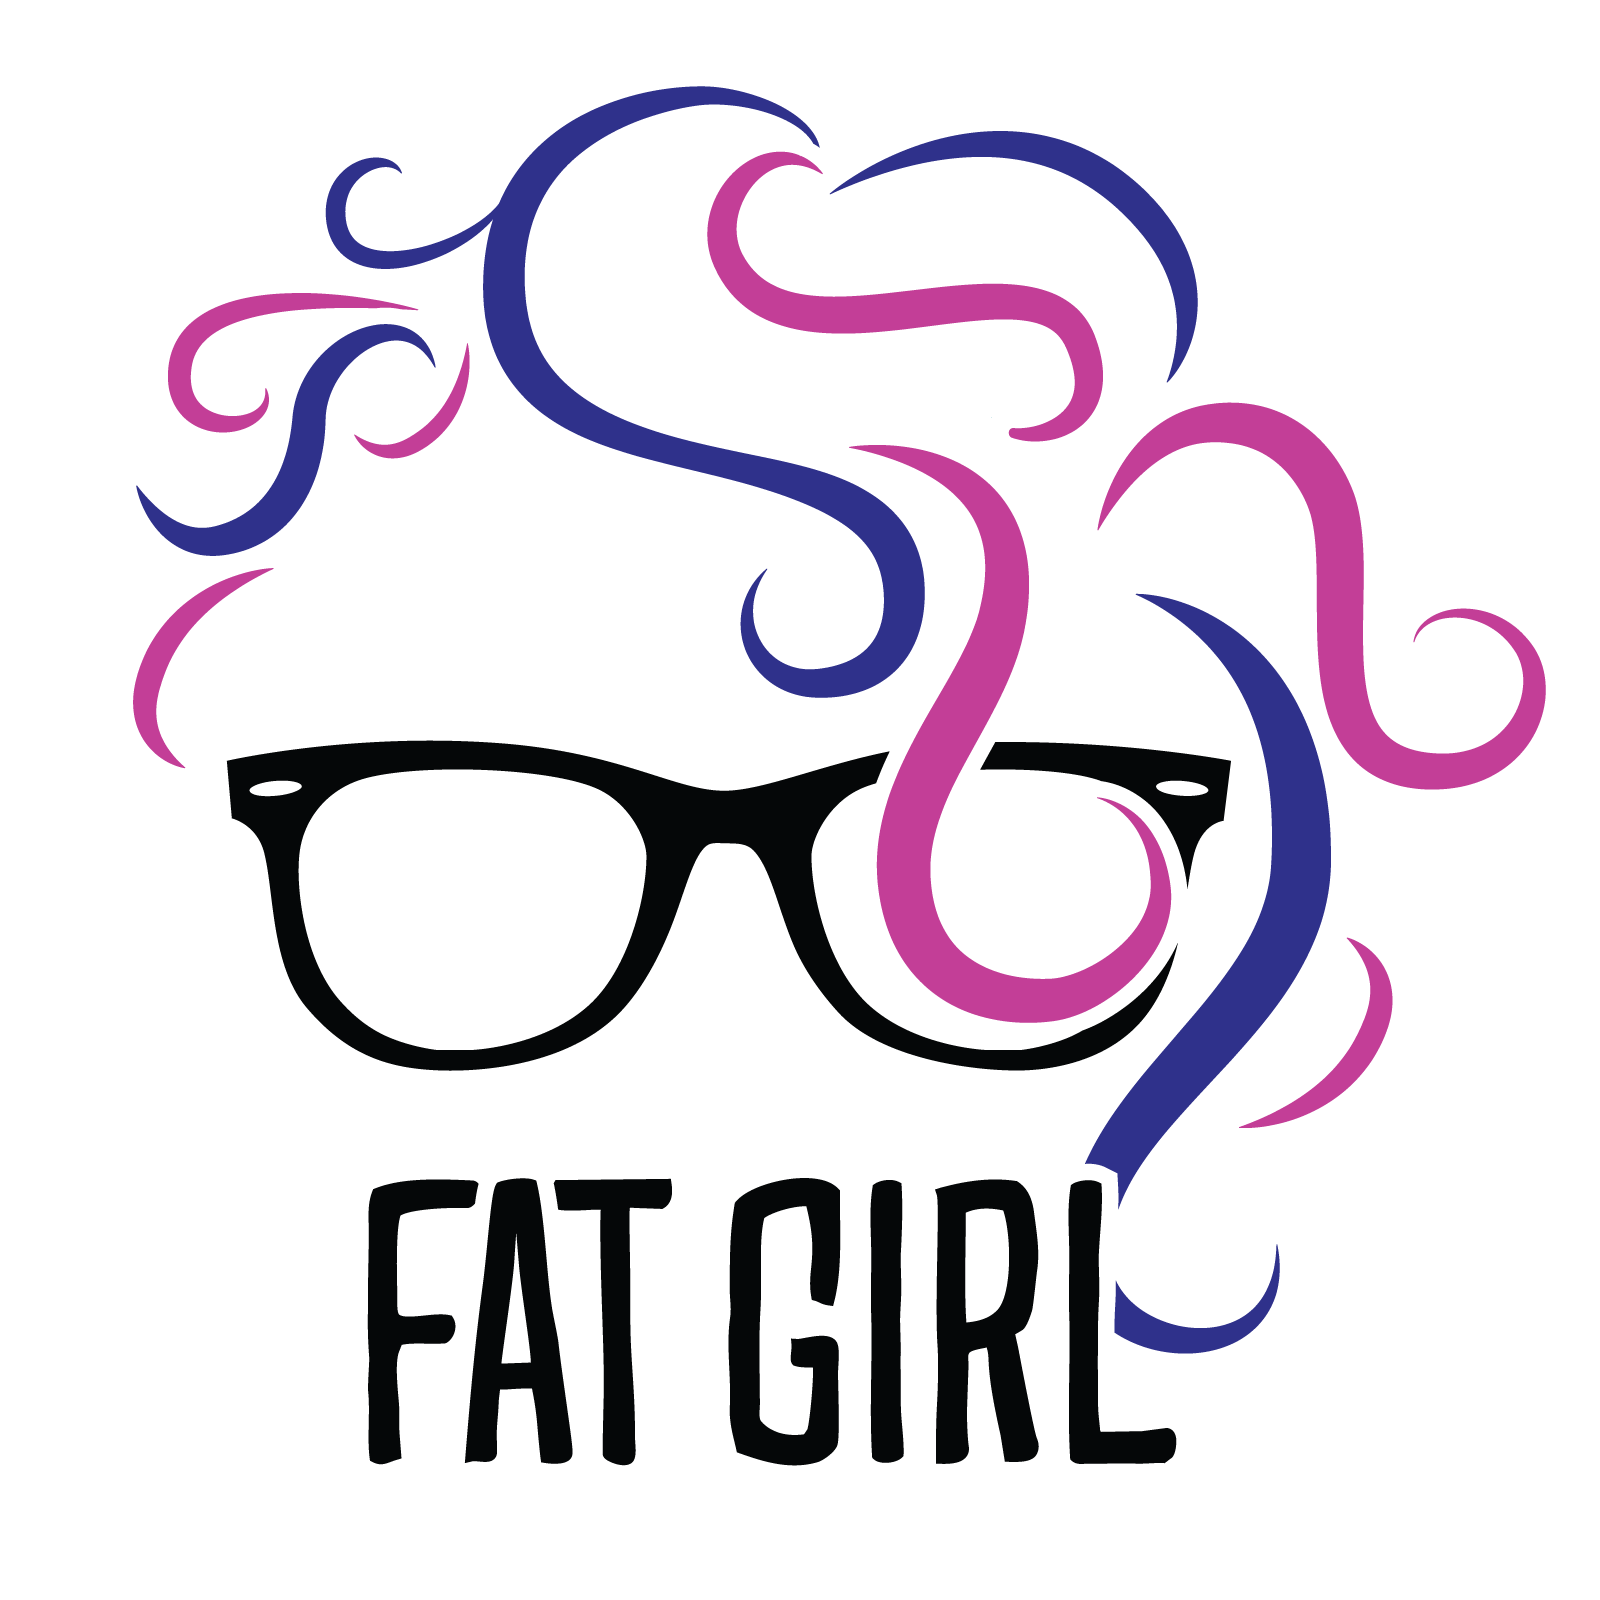 Fat baseball bat clipart graphic free download Fat Girl, Living — graphic free download